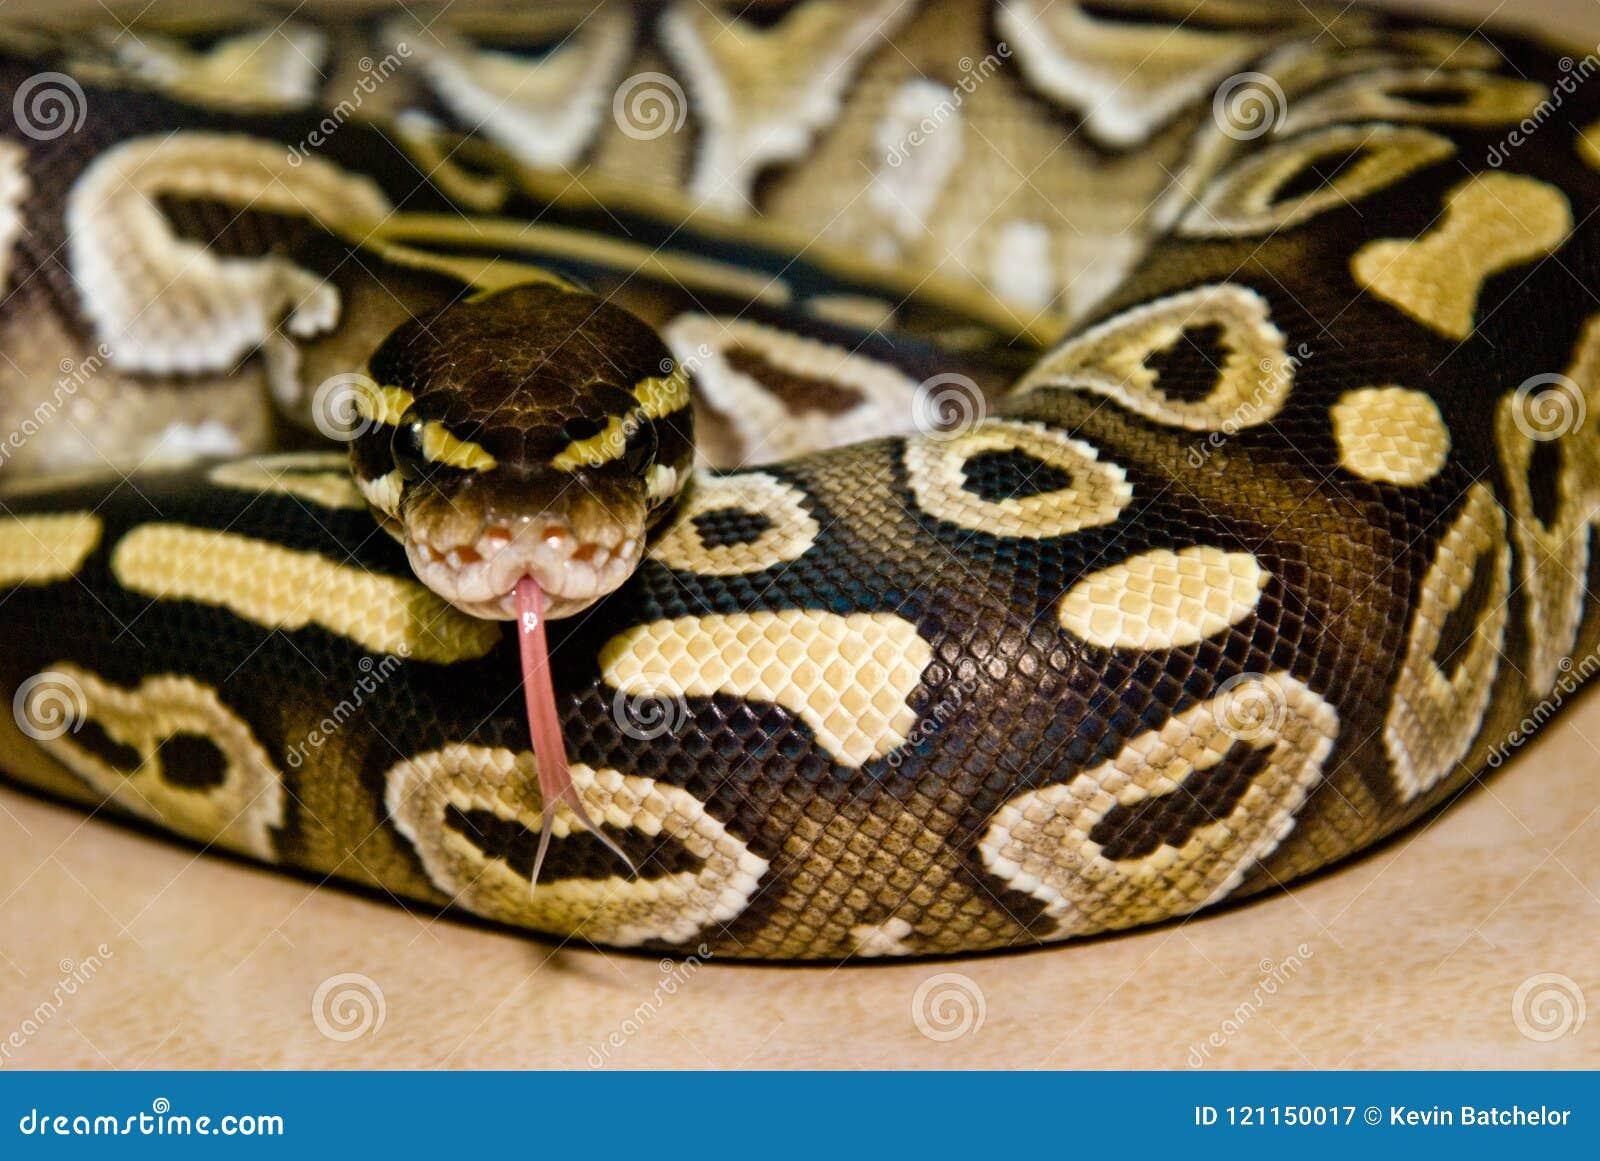 Mojave-Ball-Pythonschlange